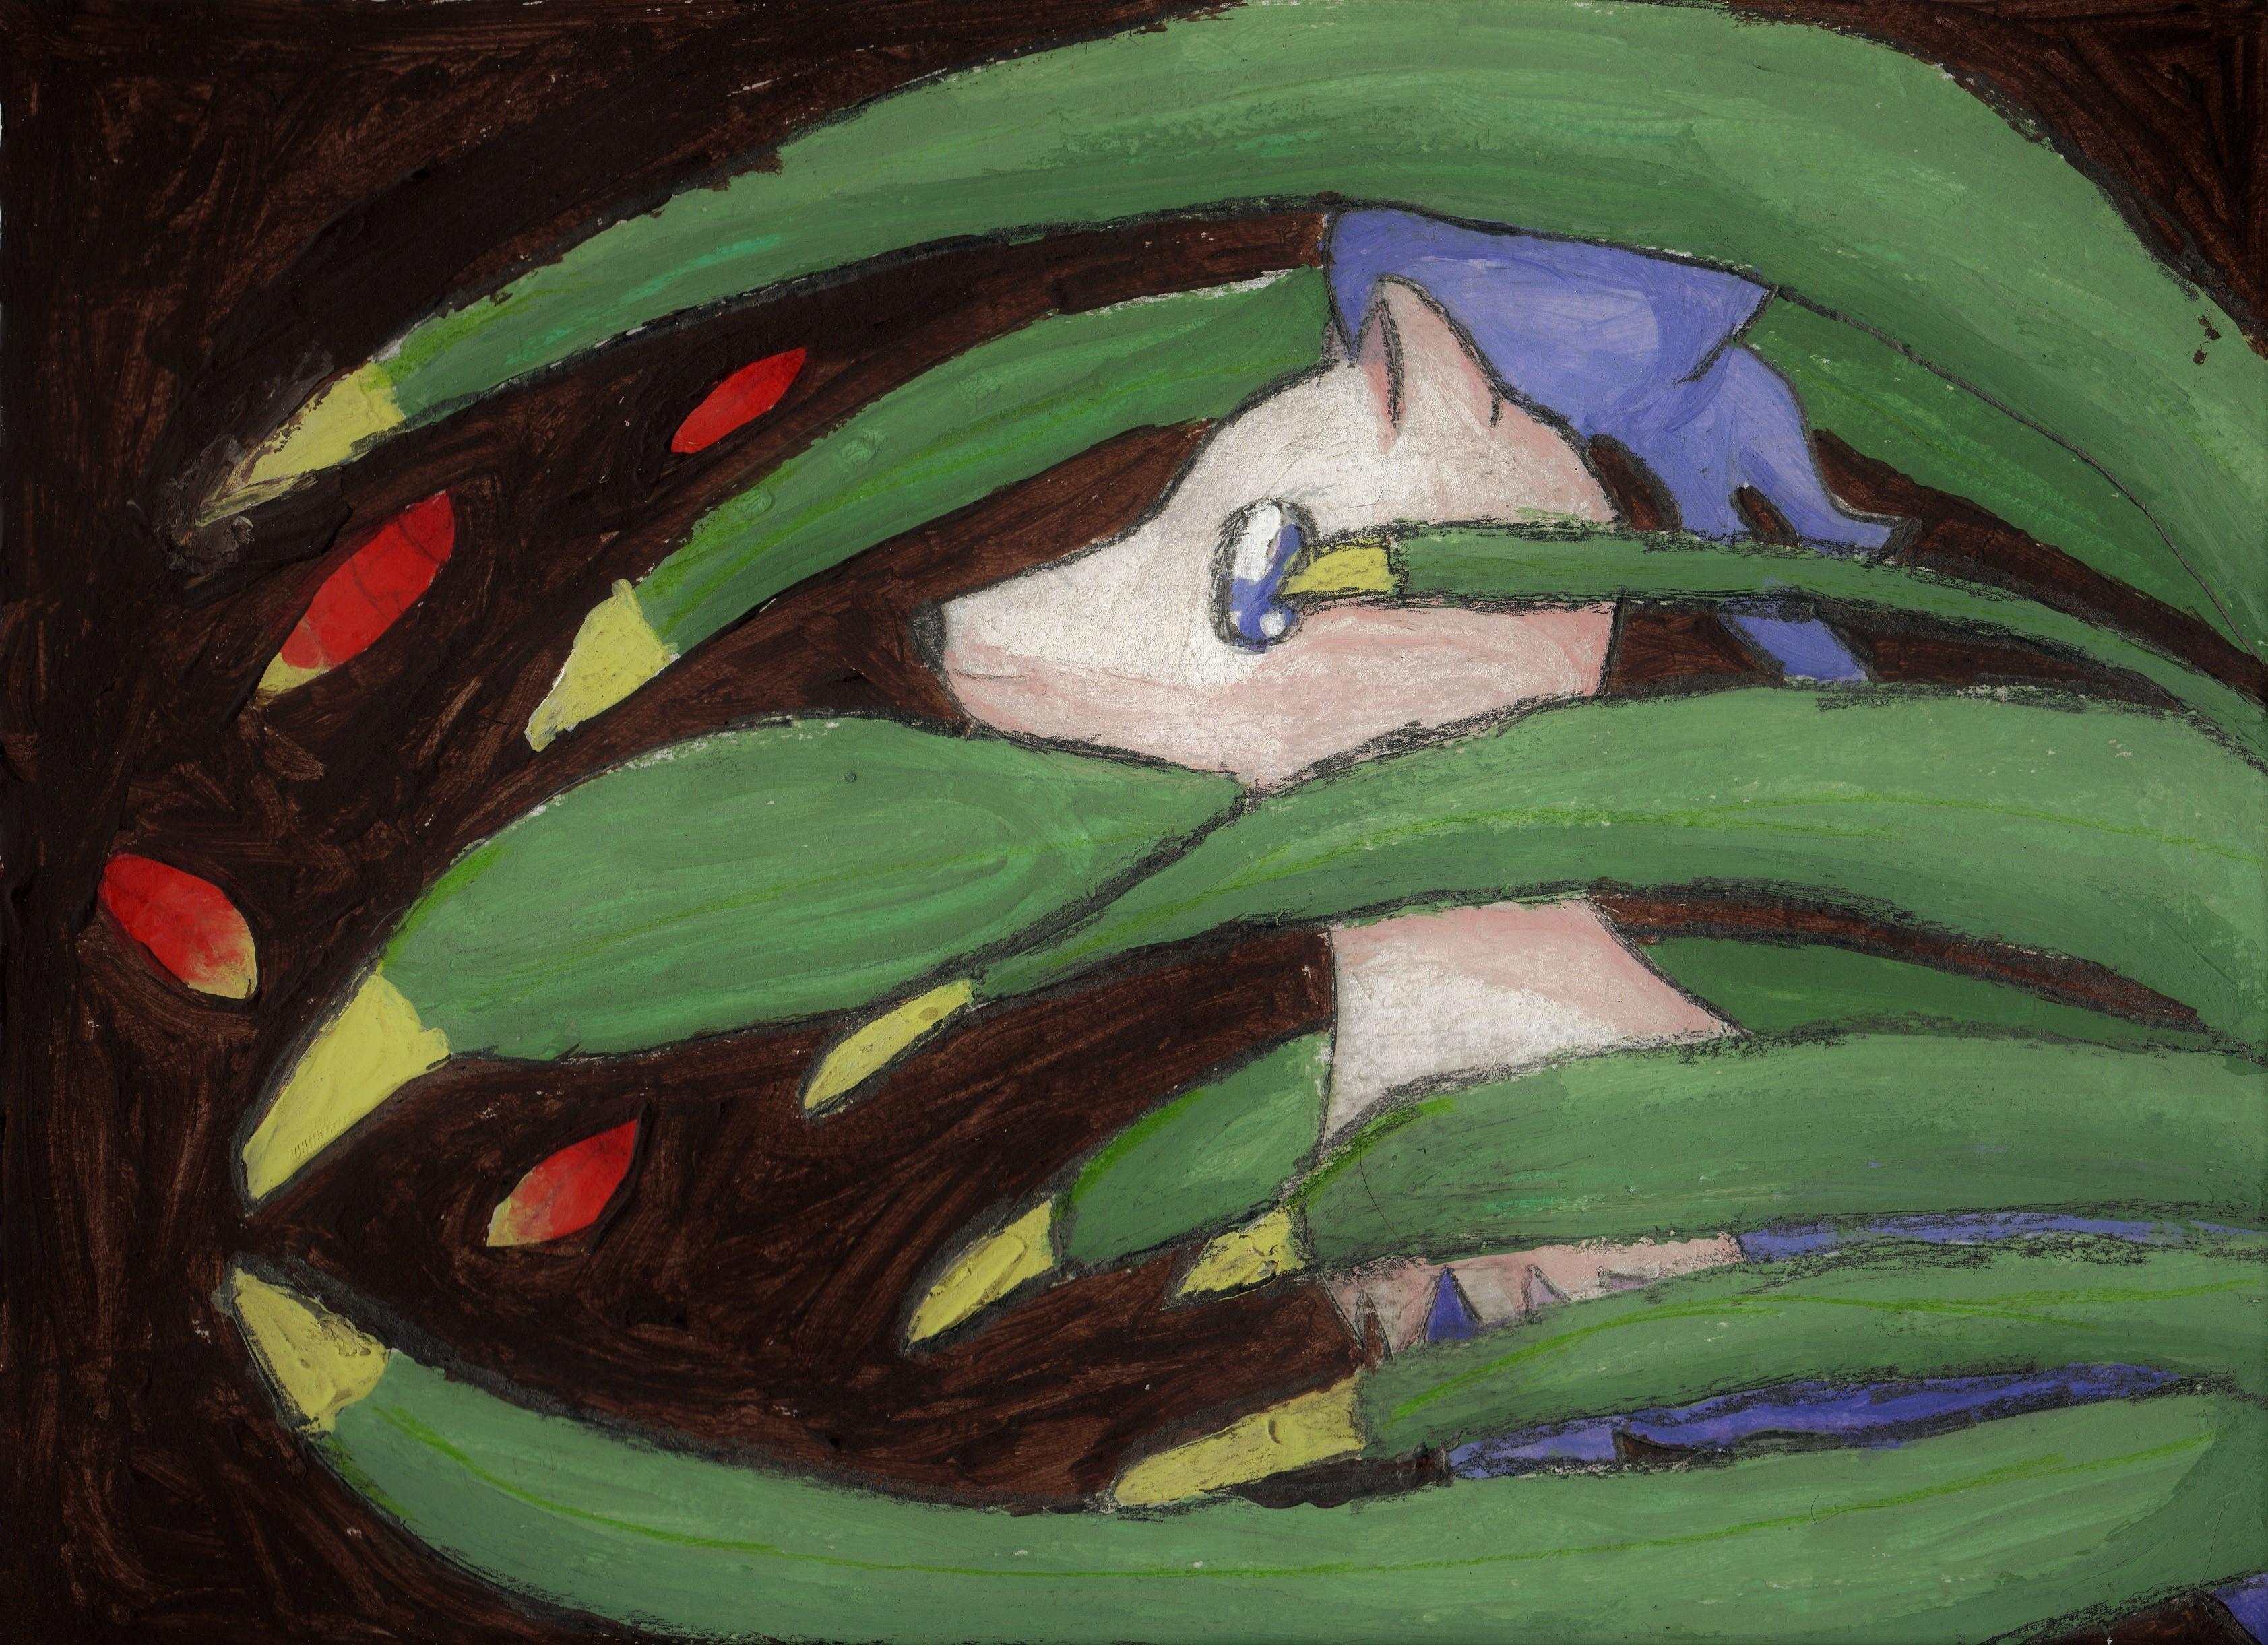 NineTales+Oddish- Two Elements Combine